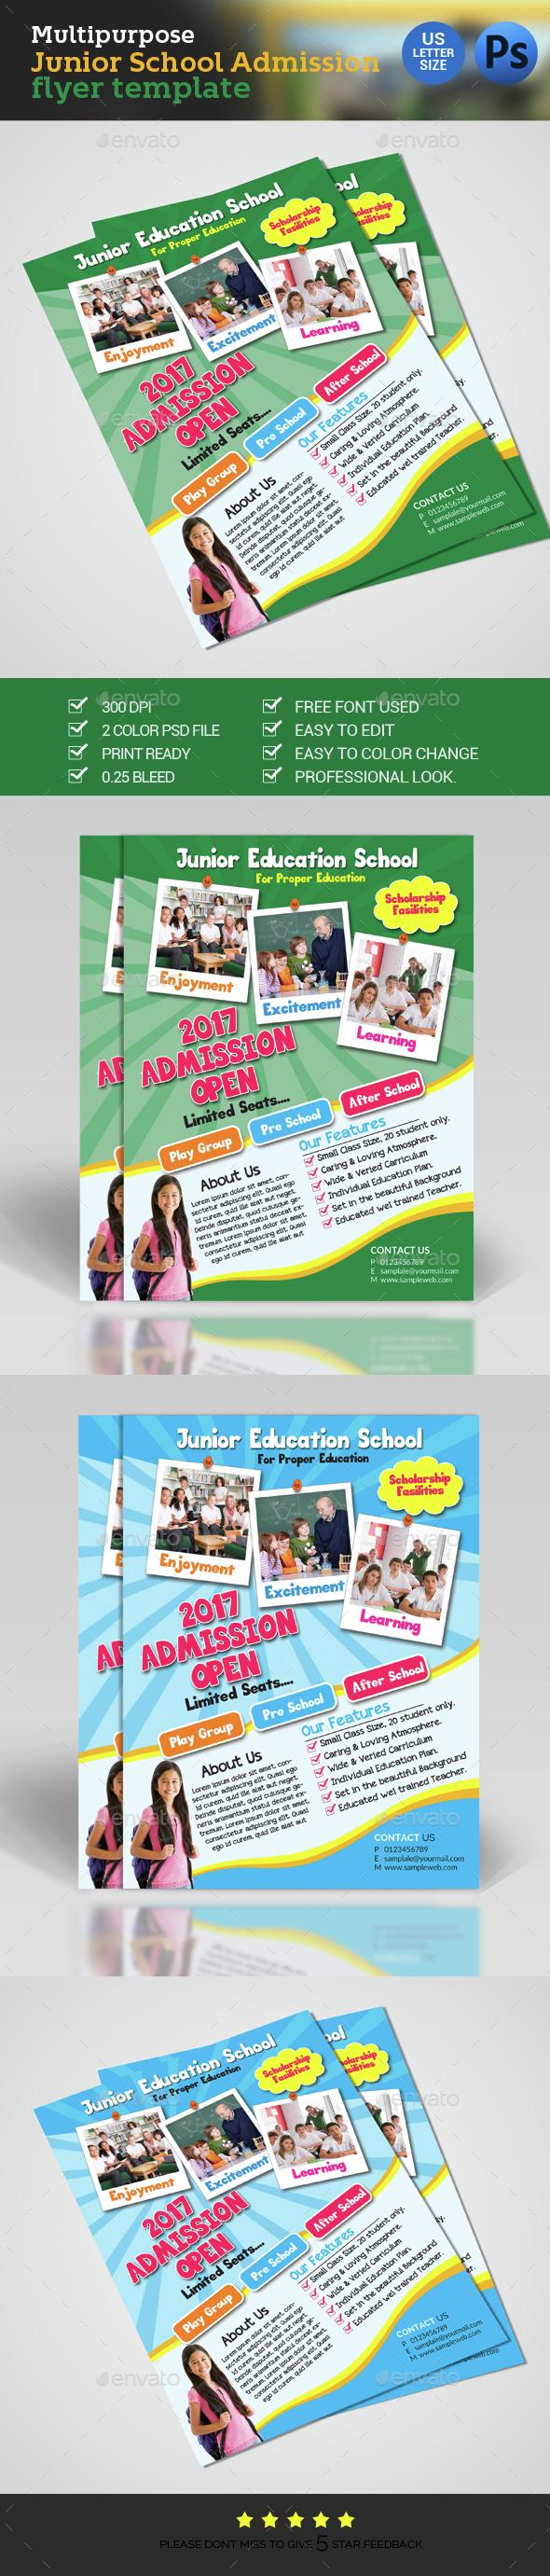 School Admission Flyer - Flyers Print Templates